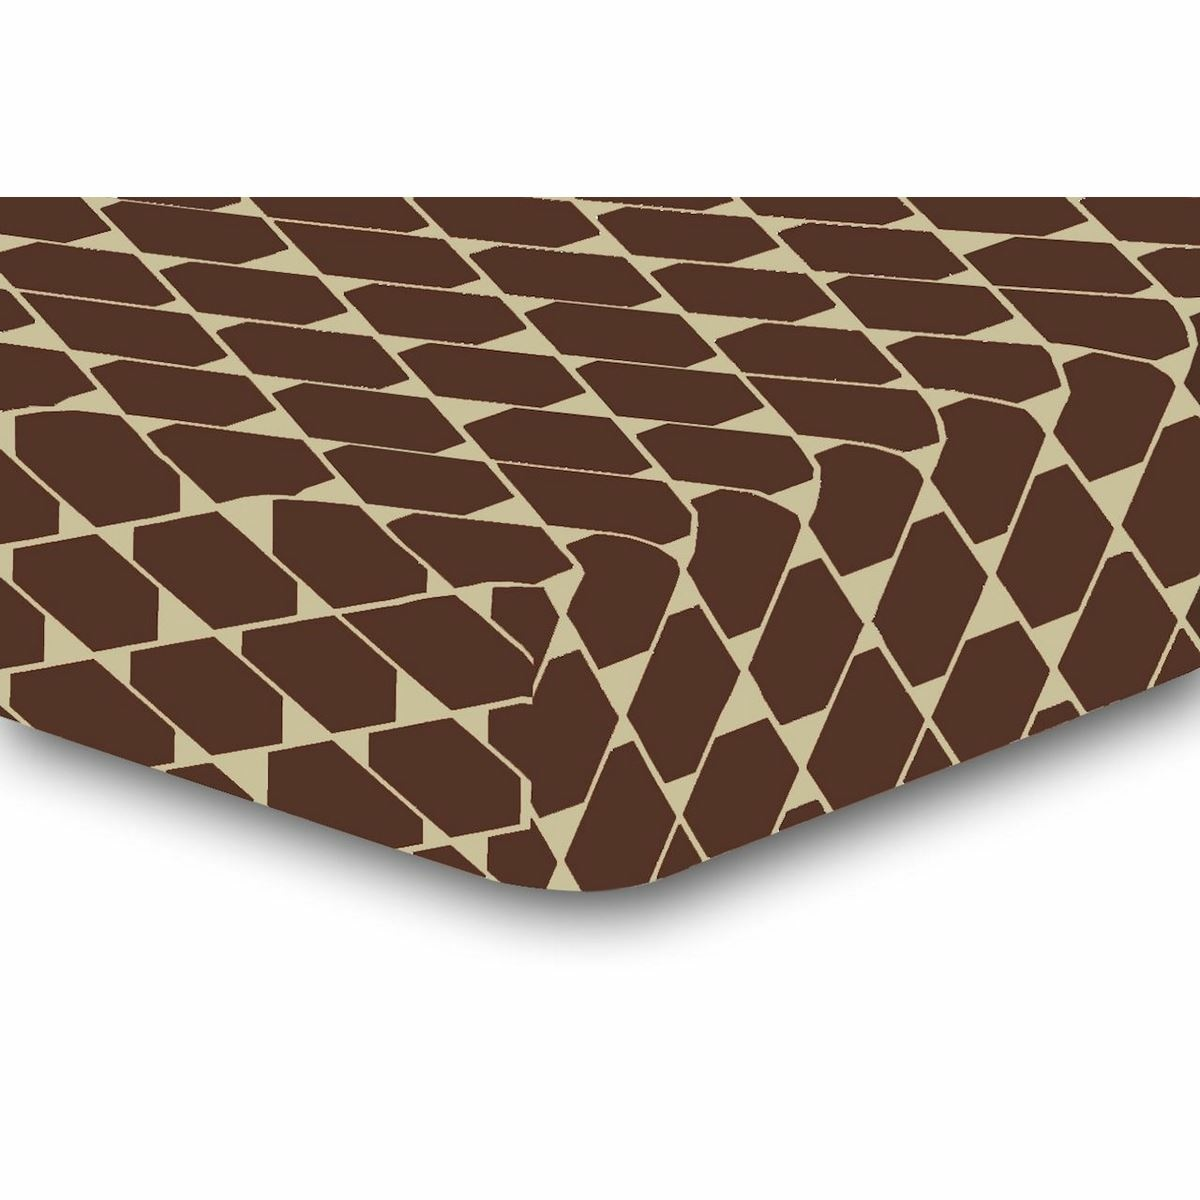 DecoKing Prostěradlo Rhombuses hnědá S2, 90 x 200 cm